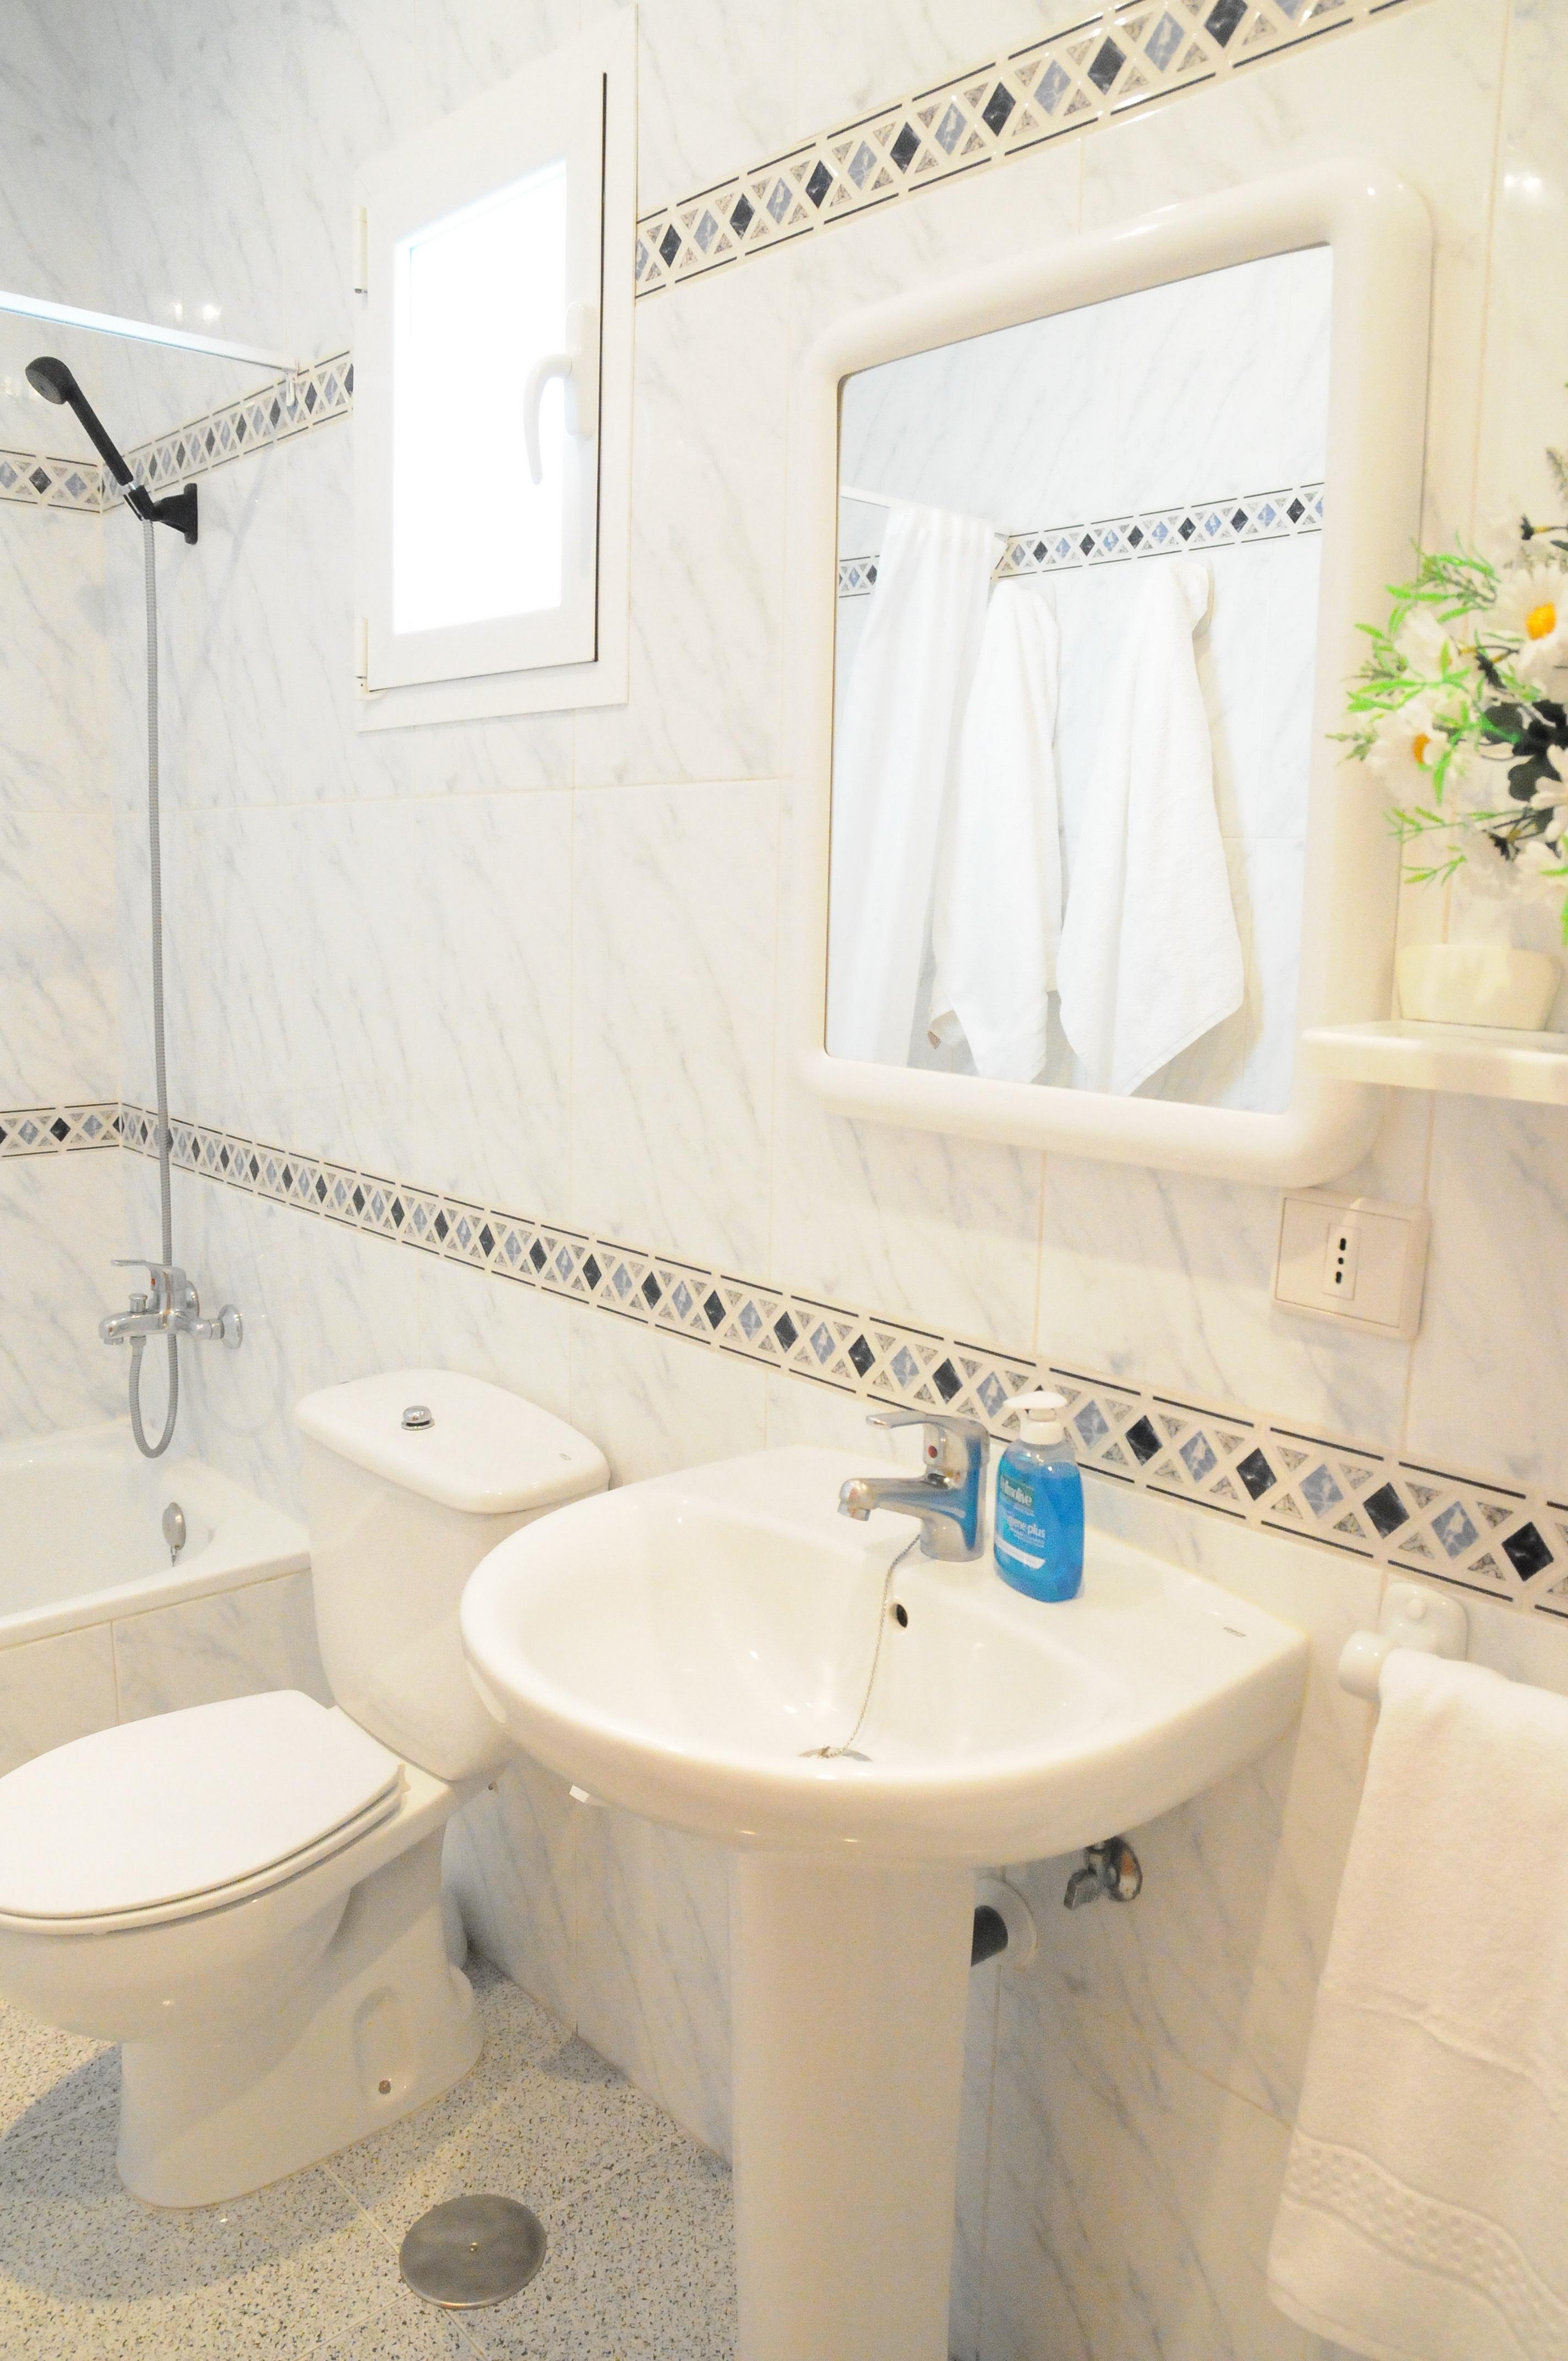 Toilet with Mirror